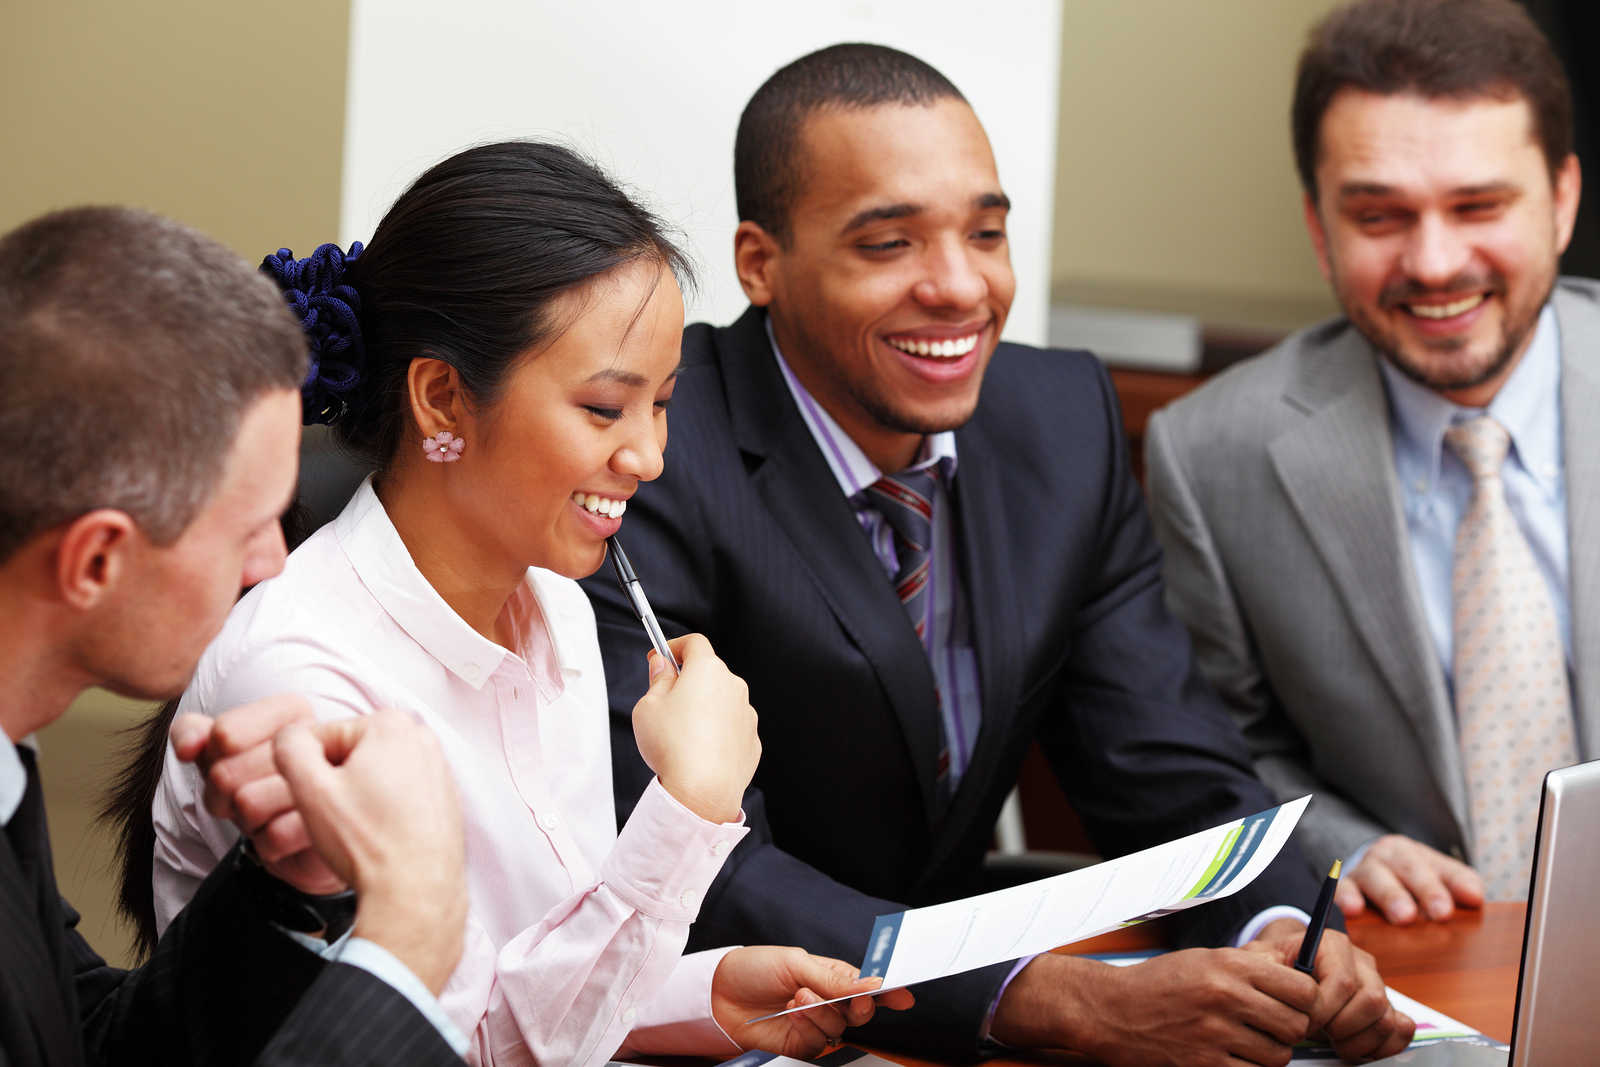 bigstock-Multi-ethnic-business-team-at--26890205